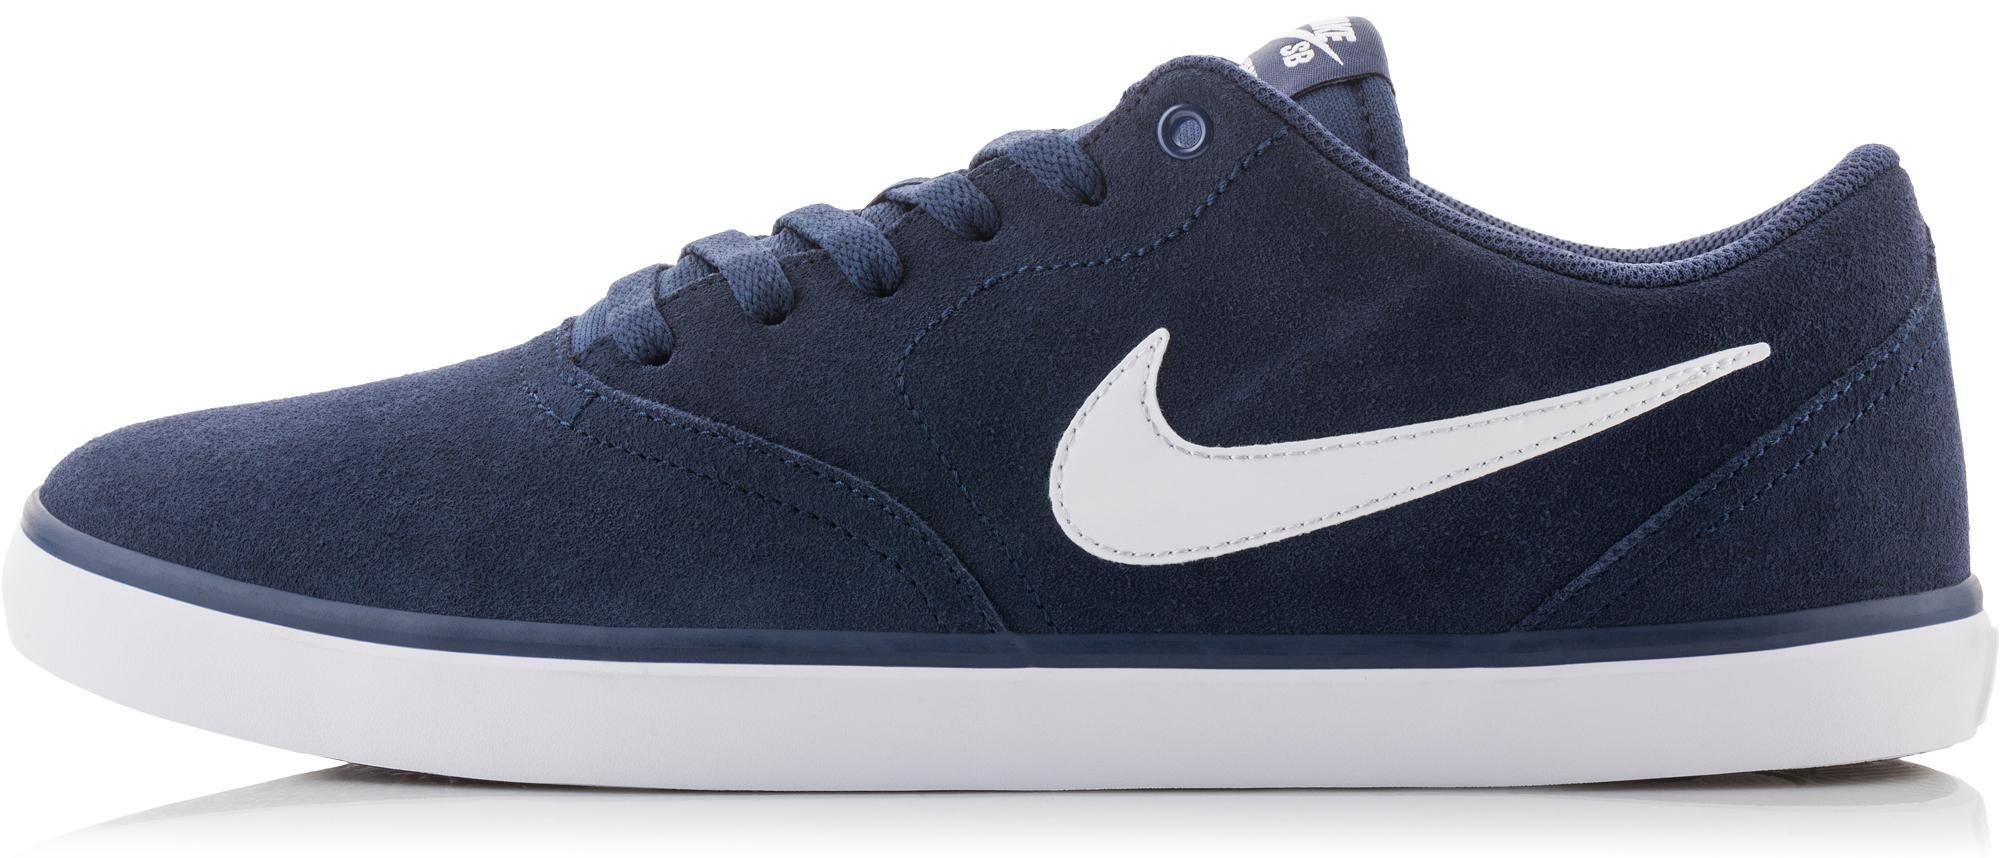 Nike Кеды мужские SB Check Solarsoft, размер 39,5